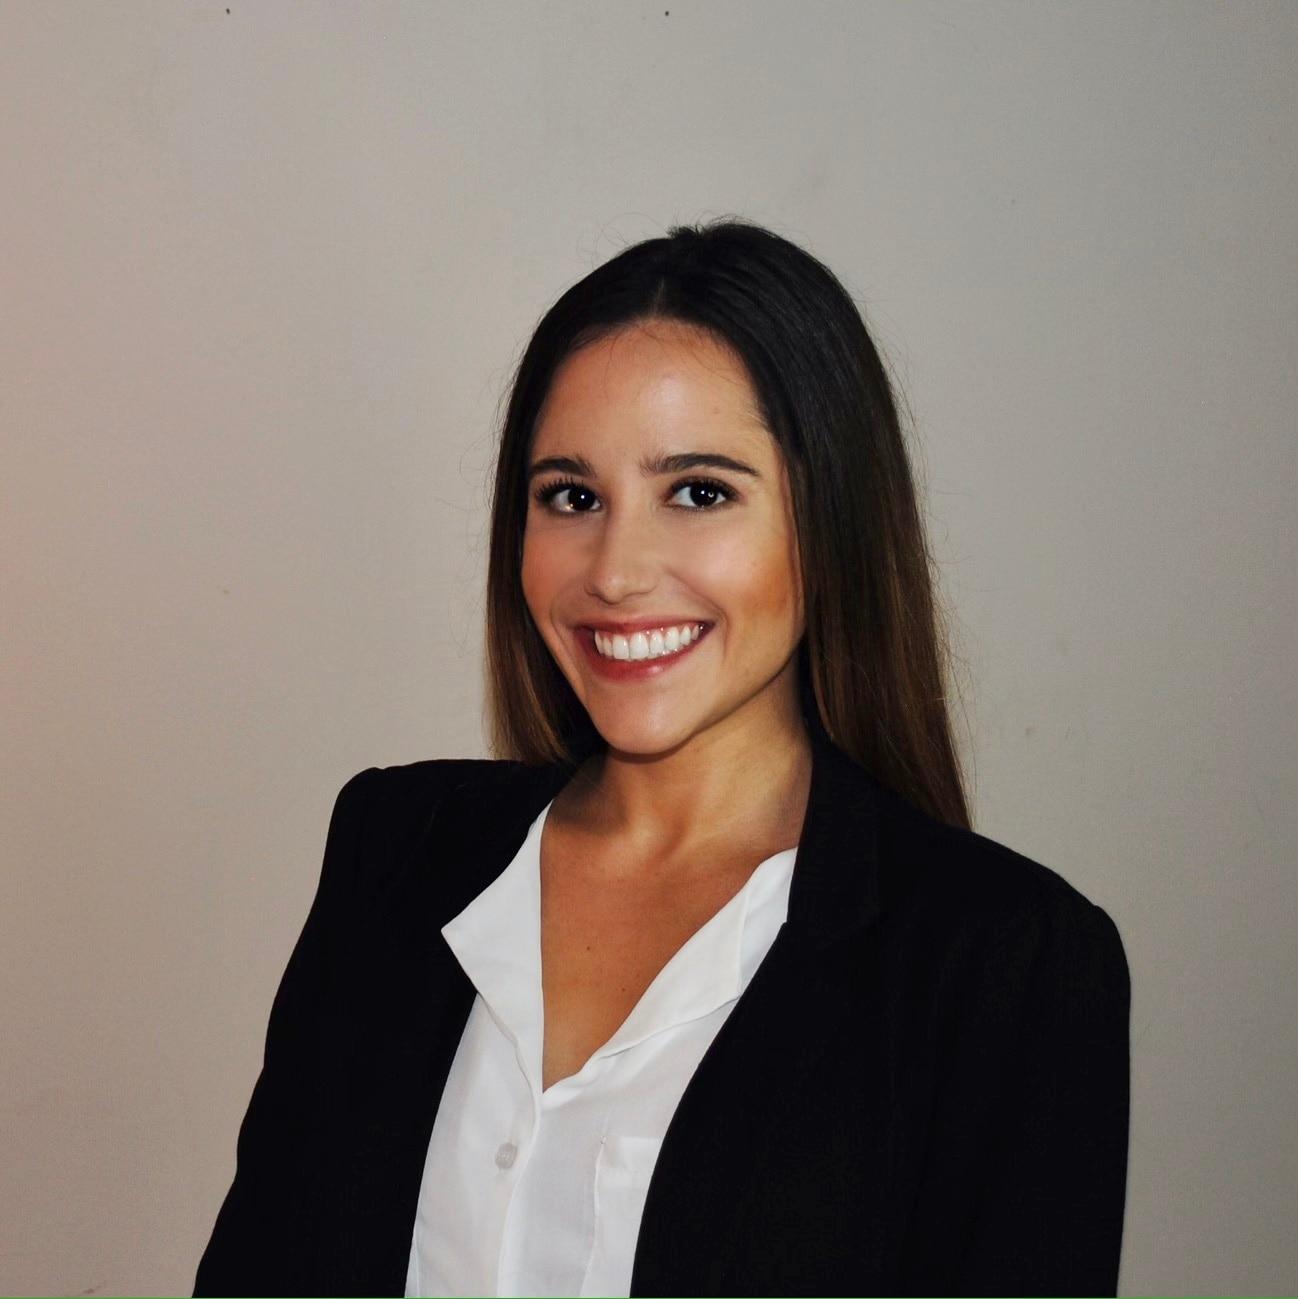 KATHERINE THERESA SCHLOEGEL  Your Financial Professional & Insurance Agent